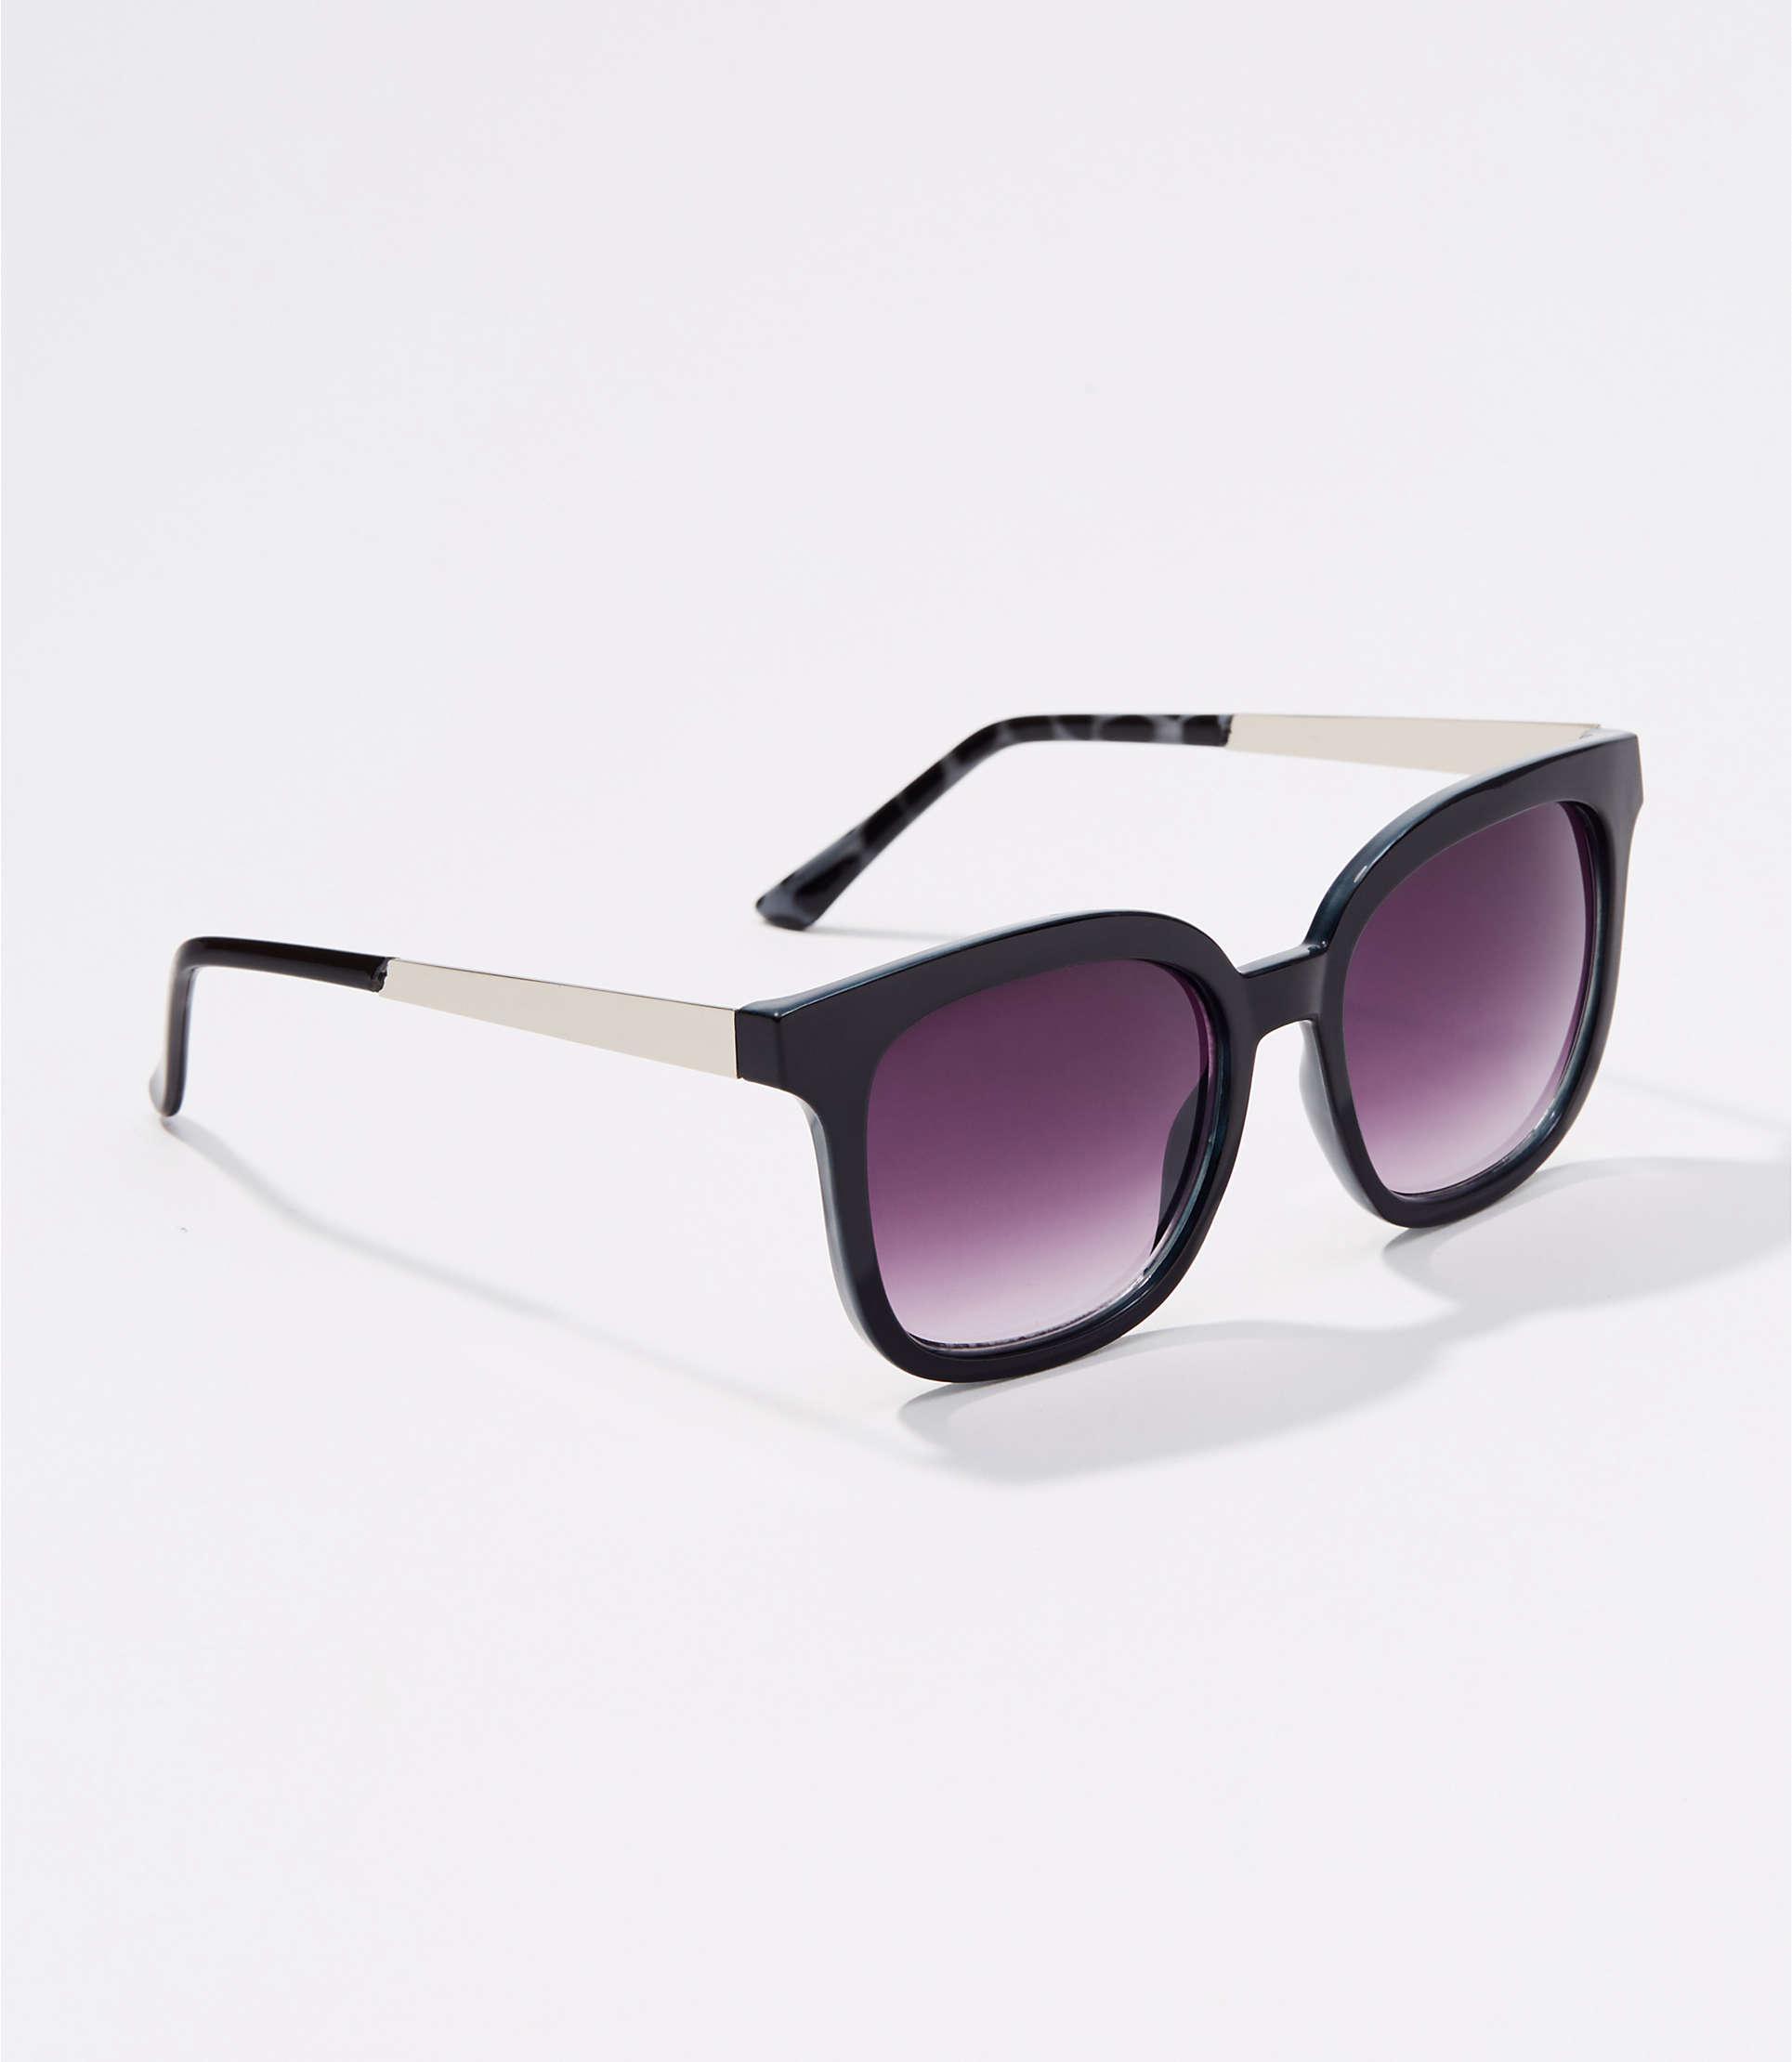 44d48289f333 Lyst - LOFT Metallic Arm Square Sunglasses in Black